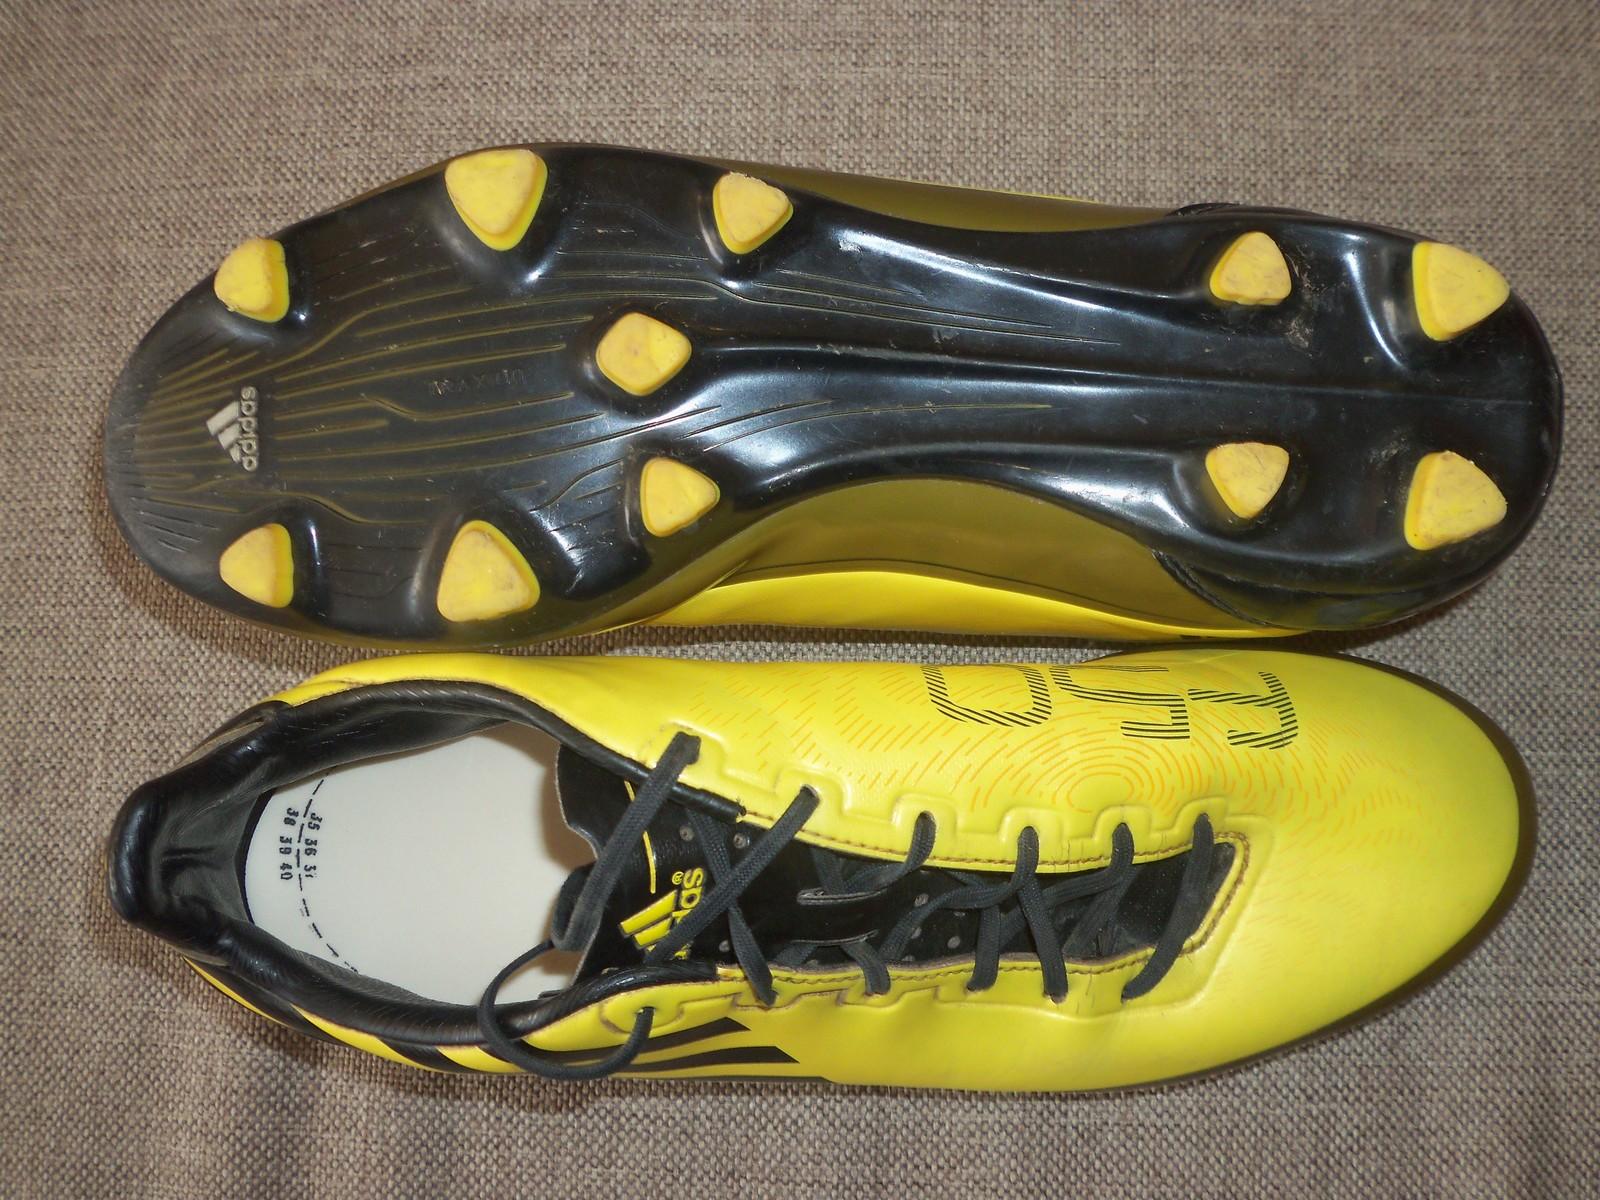 Adidas F50 F30 Fg Uk 8 Usa Scarpe Da Calcio E 50 Oggetti Simili